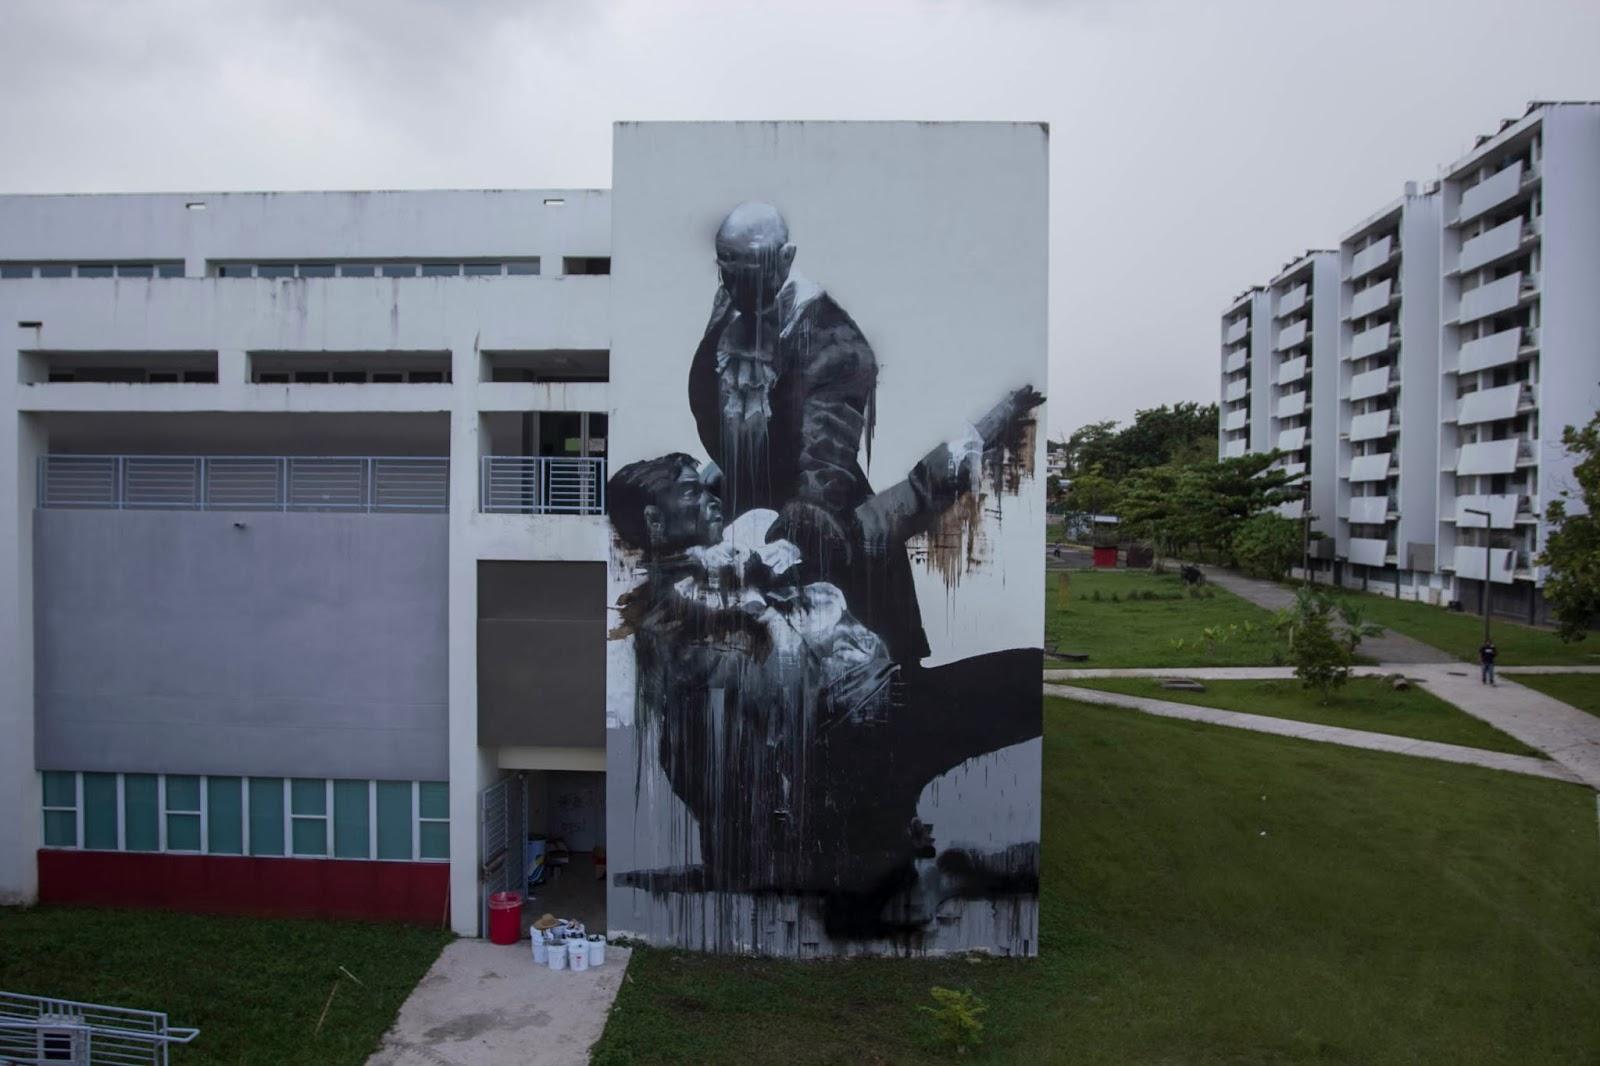 conor-harrington-new-mural-for-los-muros-hablan-festival-01